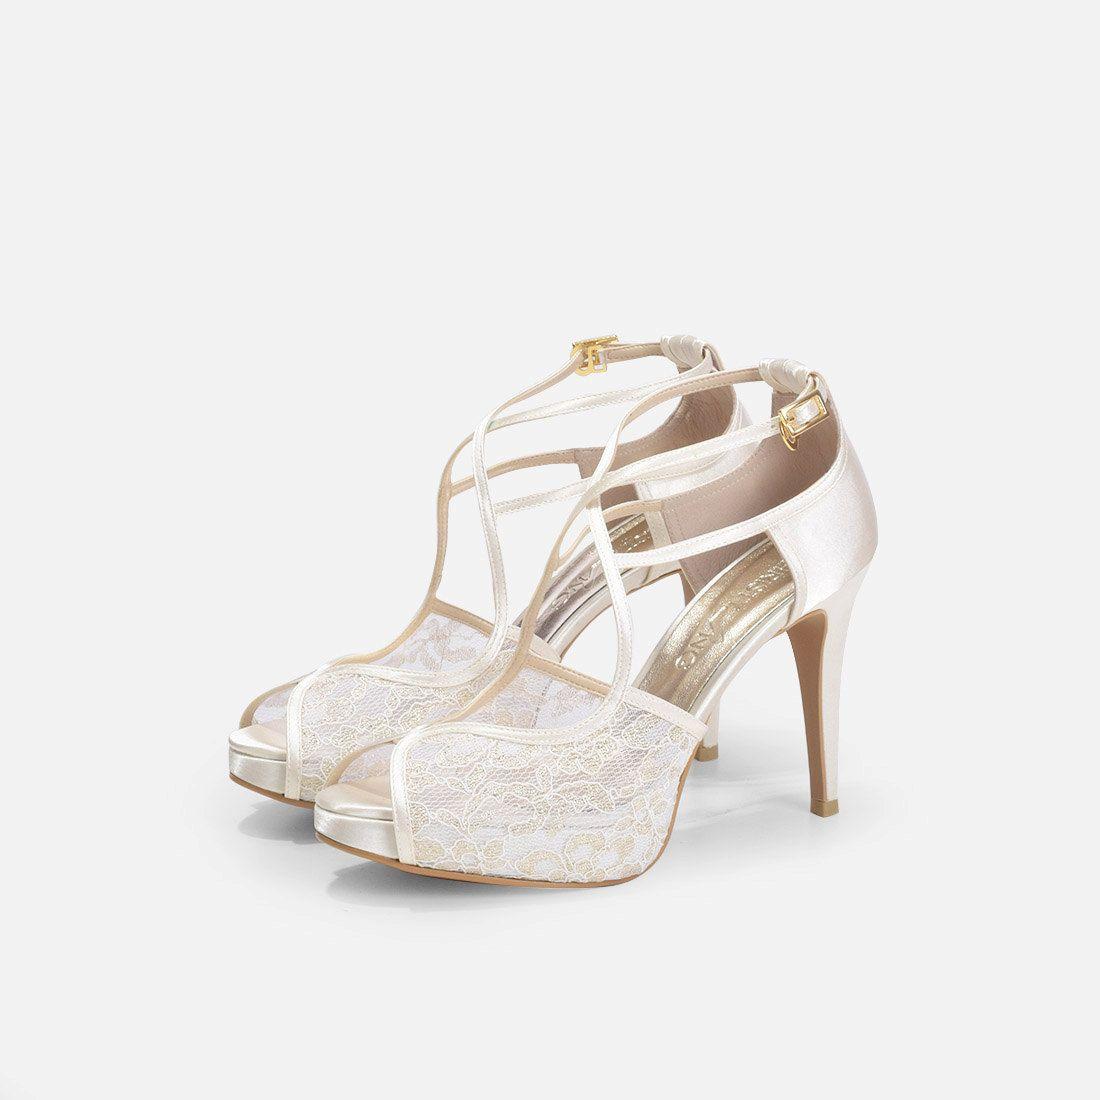 Viviana Ivory Lace Dress Shoes, Ivory Evening Heel, Lace